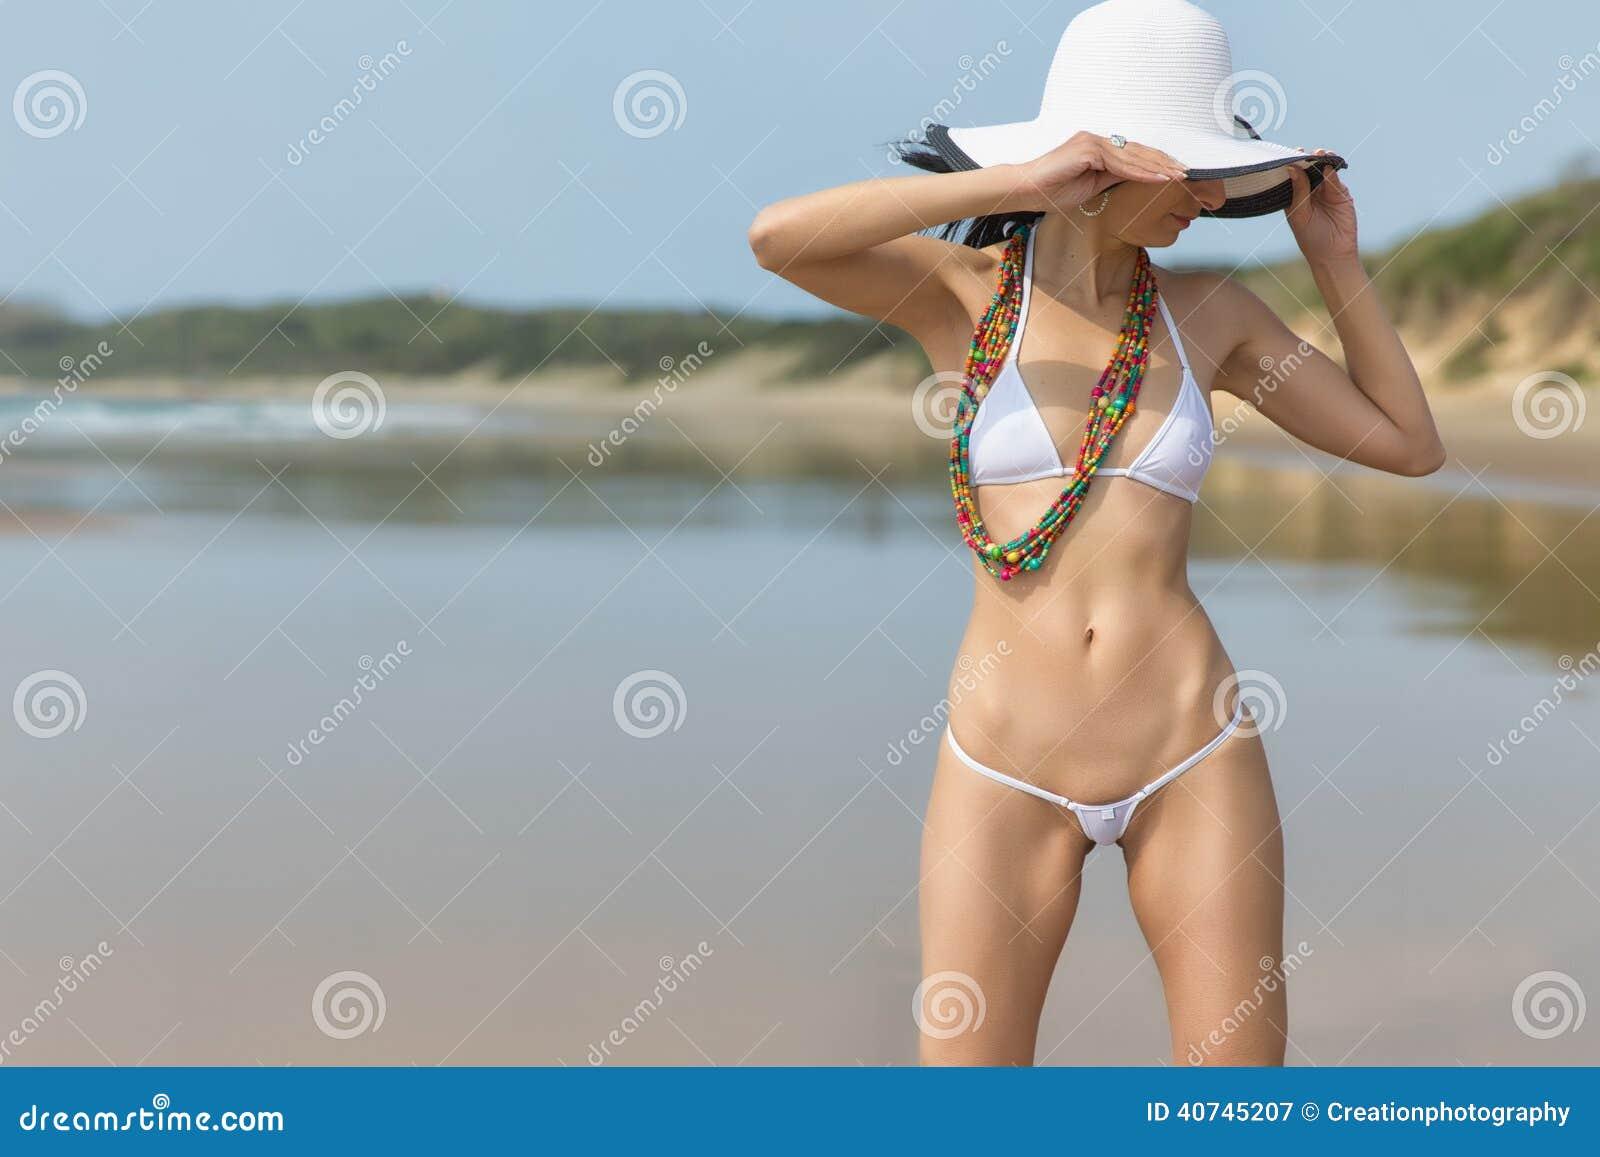 Woman Wearing White String Bikini Stock Photo Image